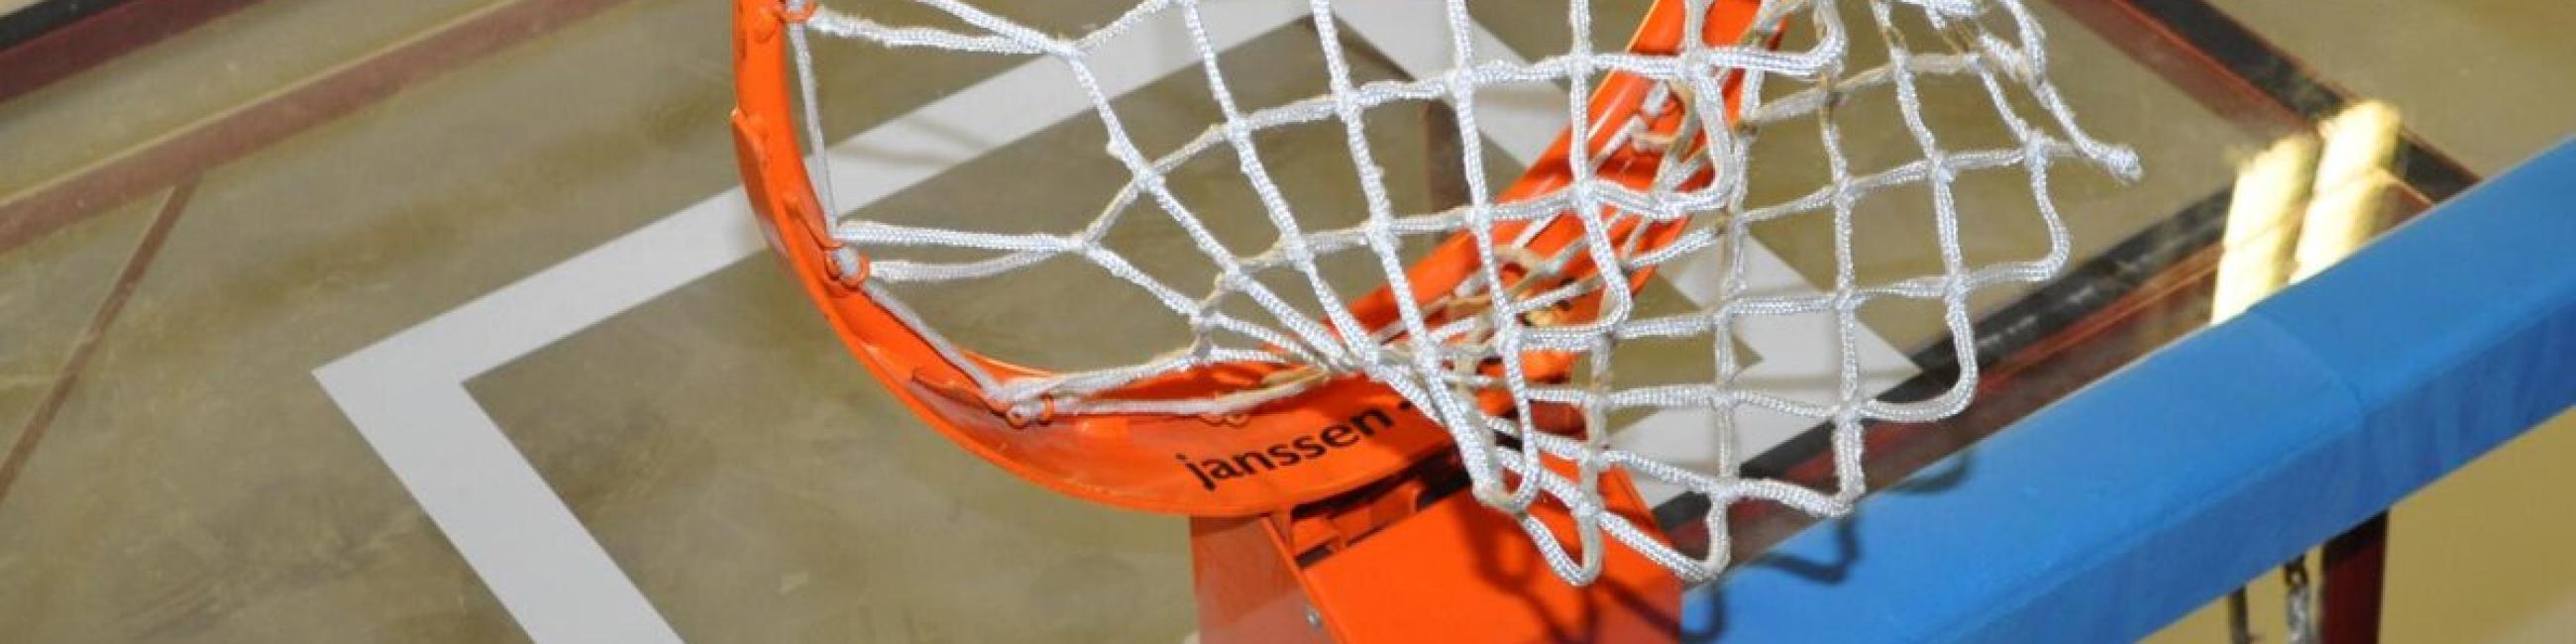 basketring